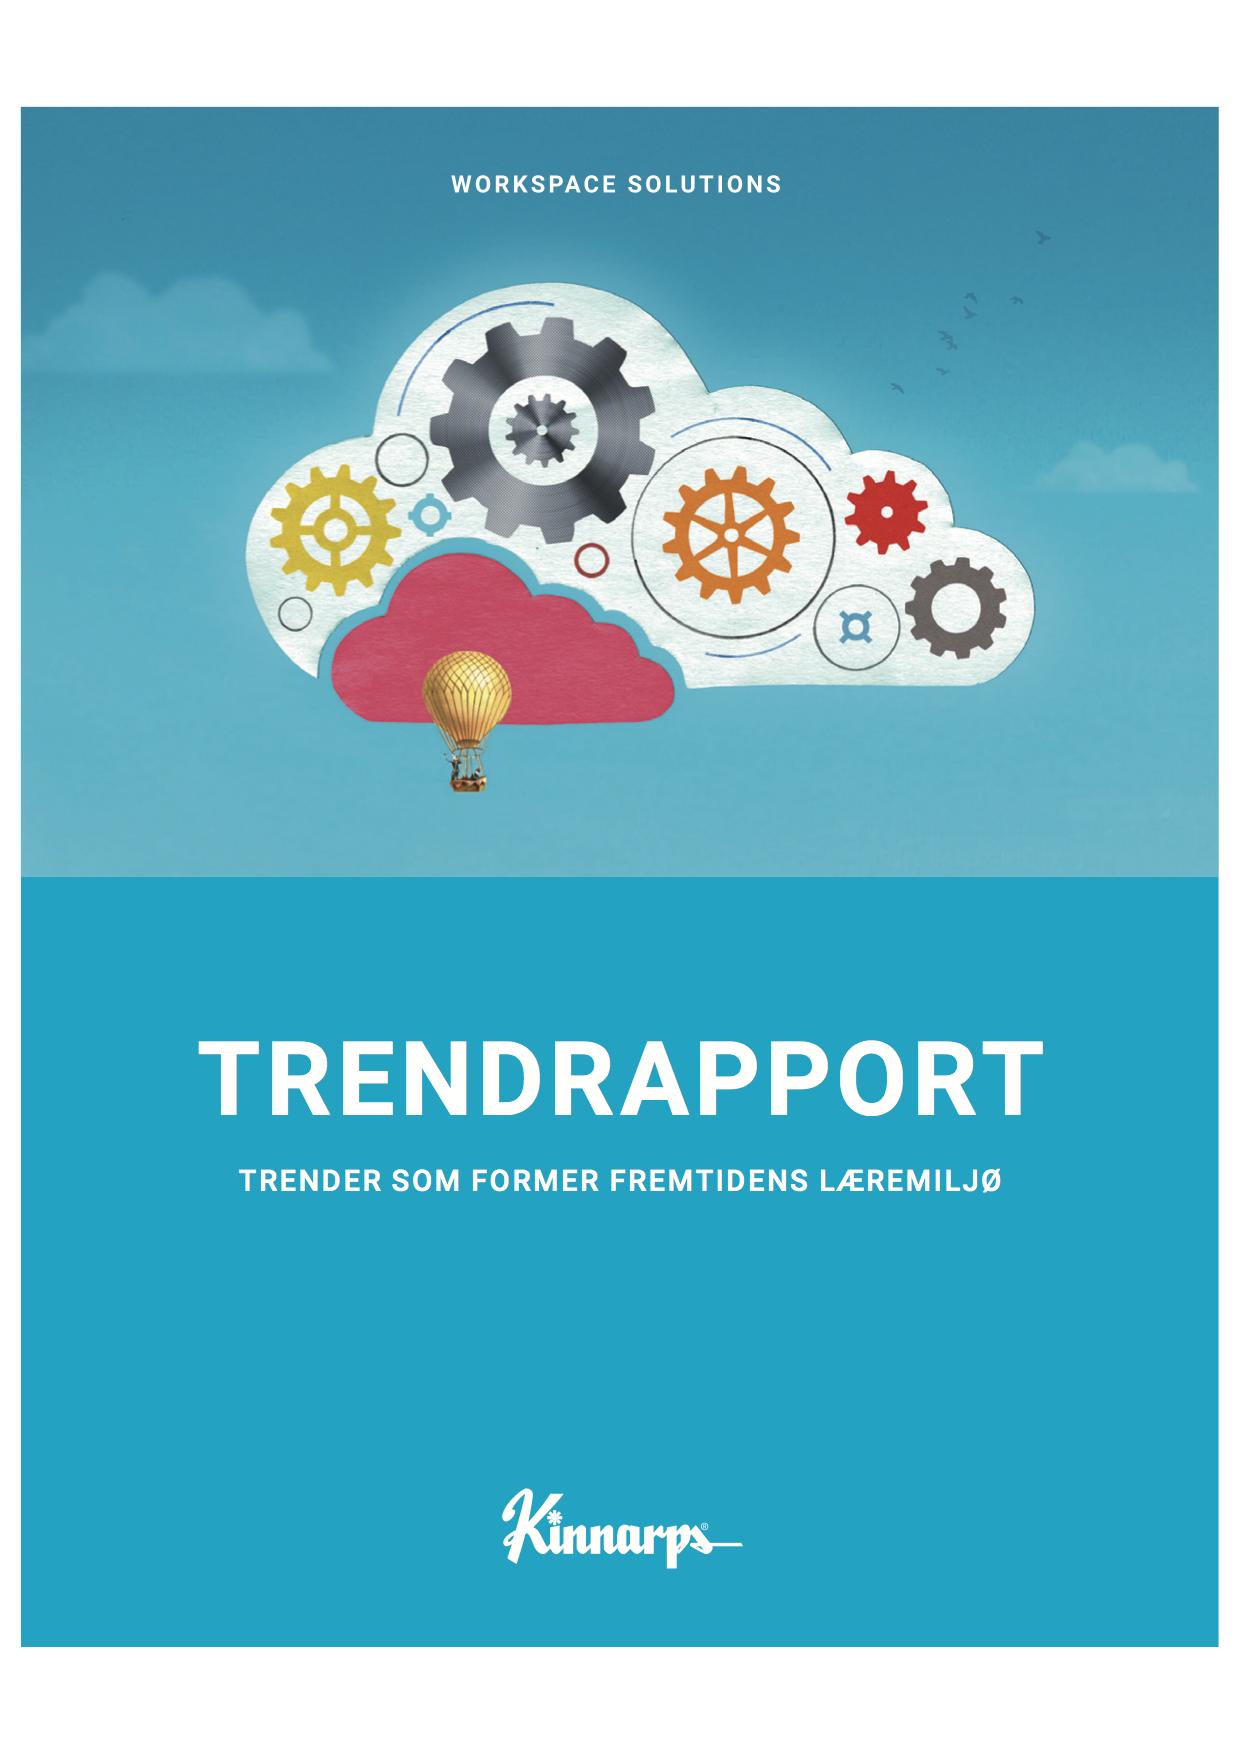 Forside_trendrapport_2017.png